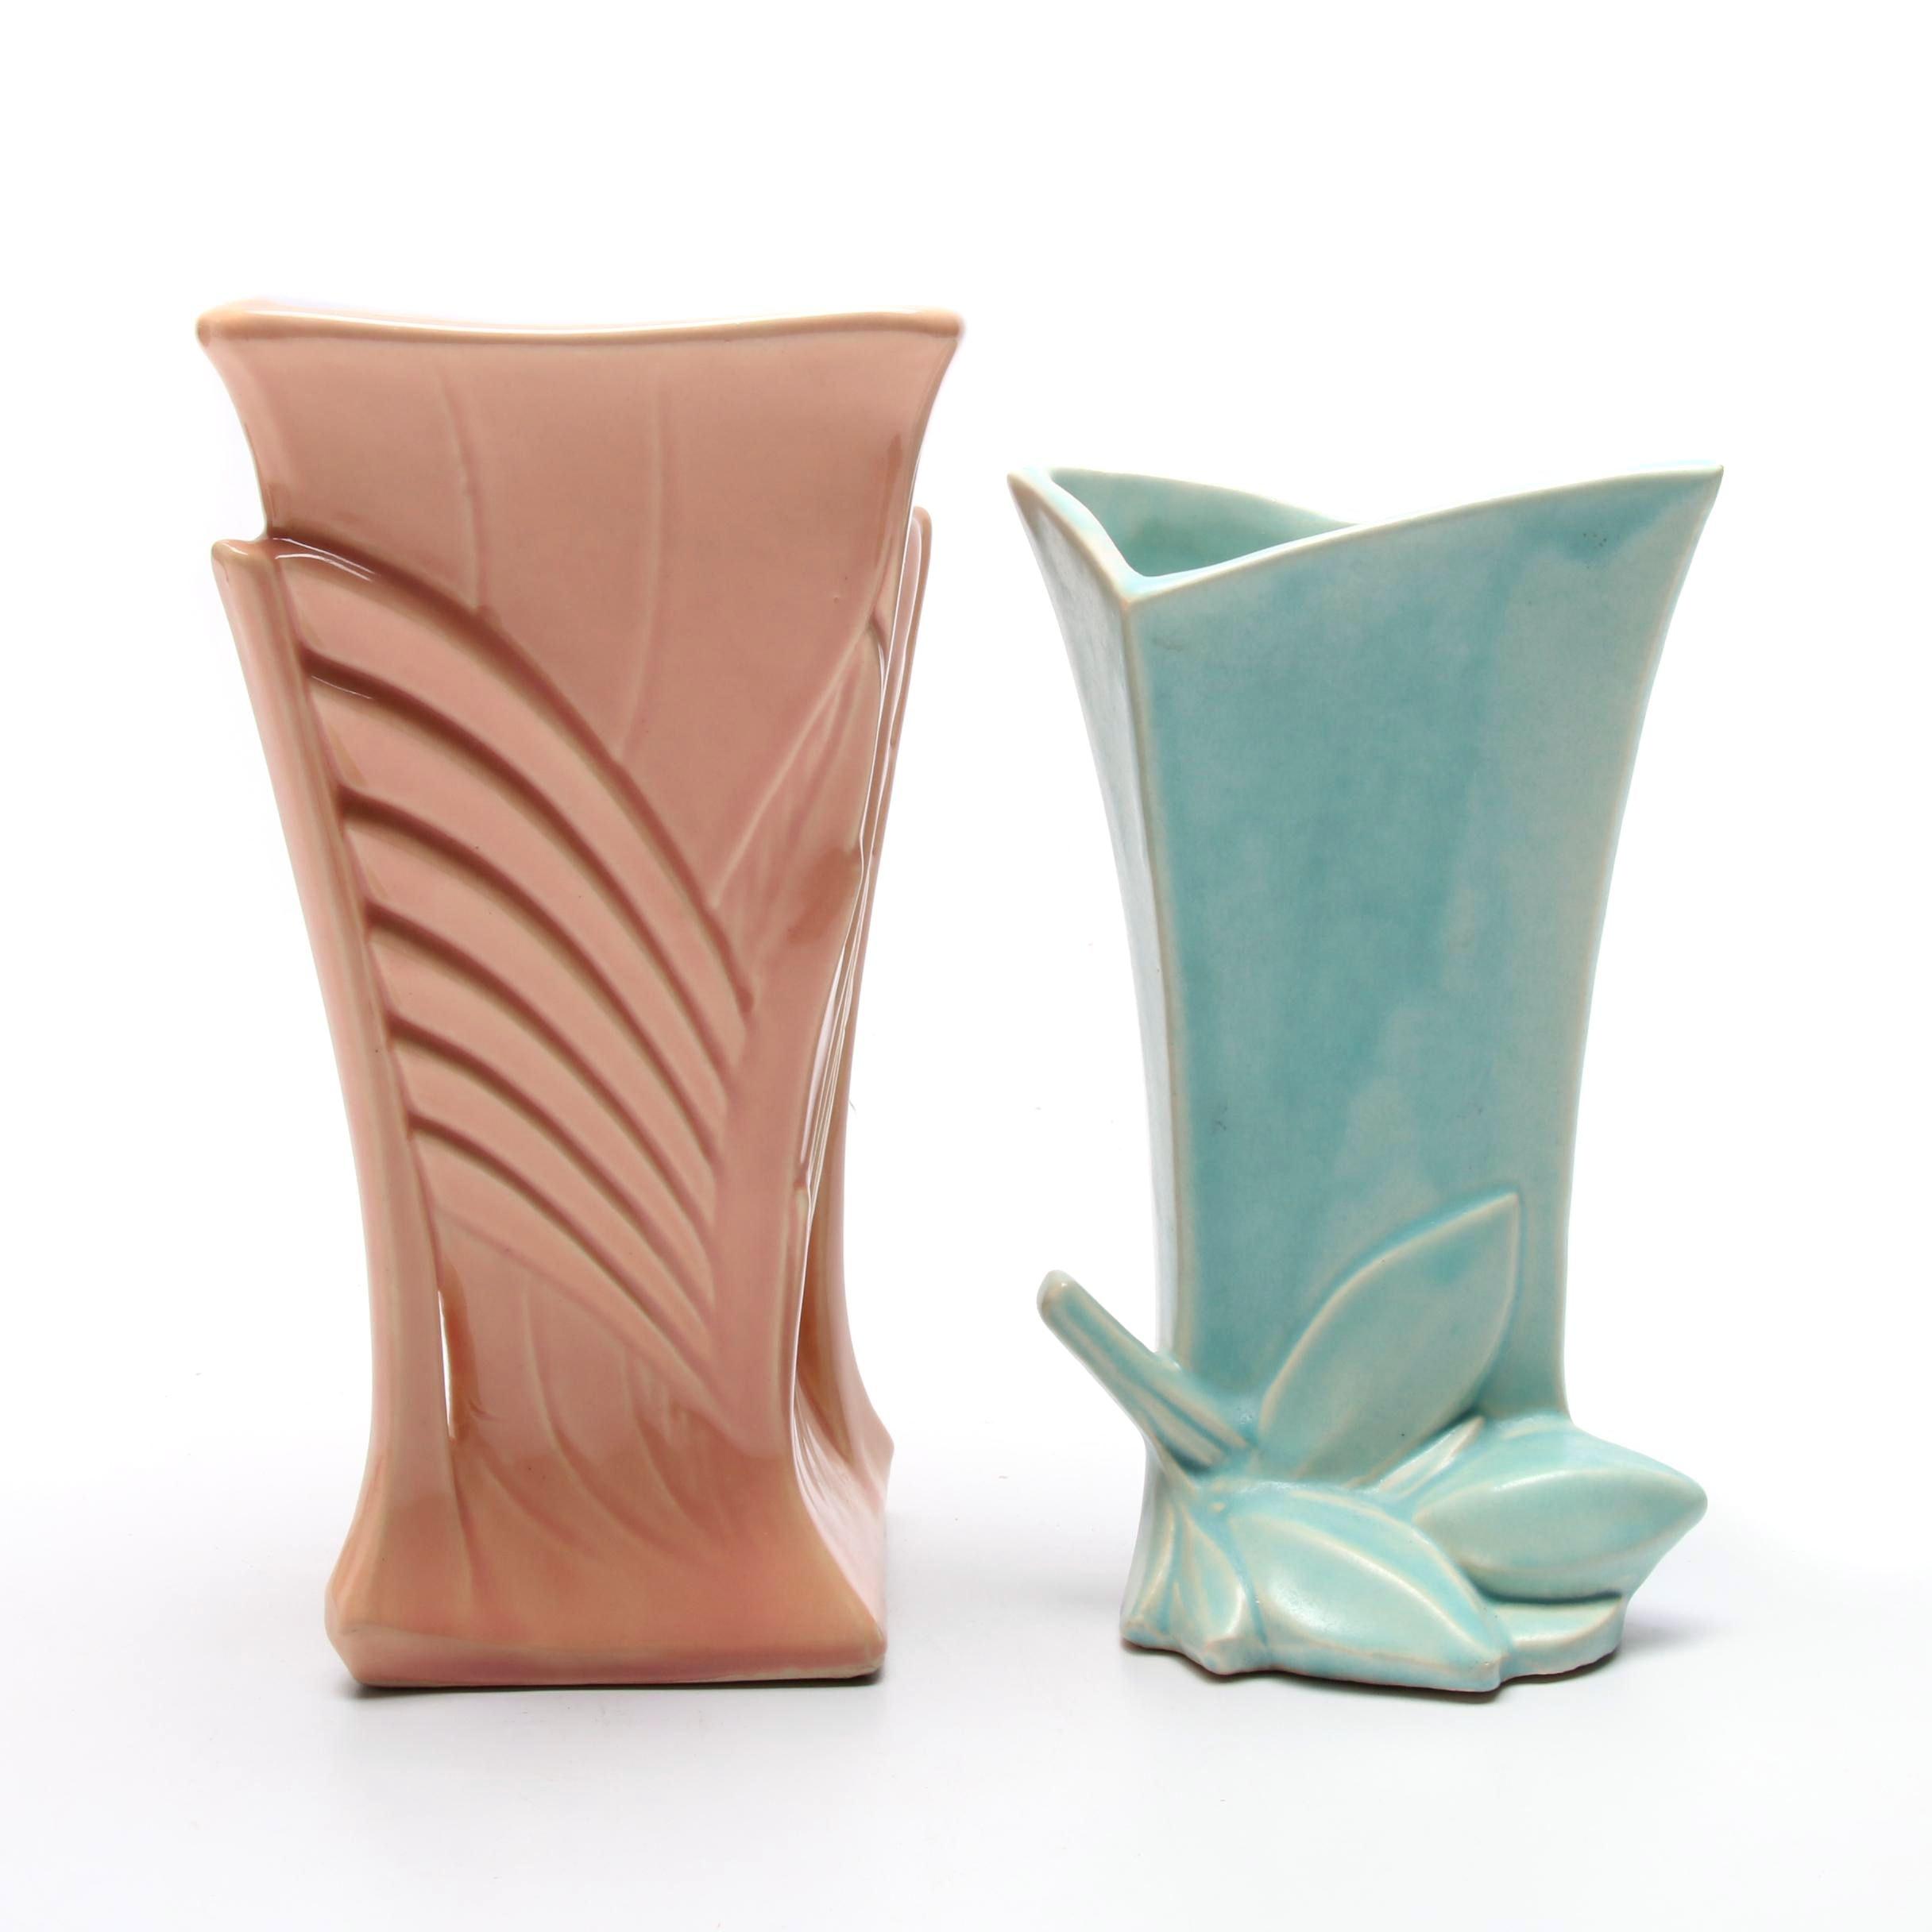 McCoy and Nelson McCoy Earthenware Vases